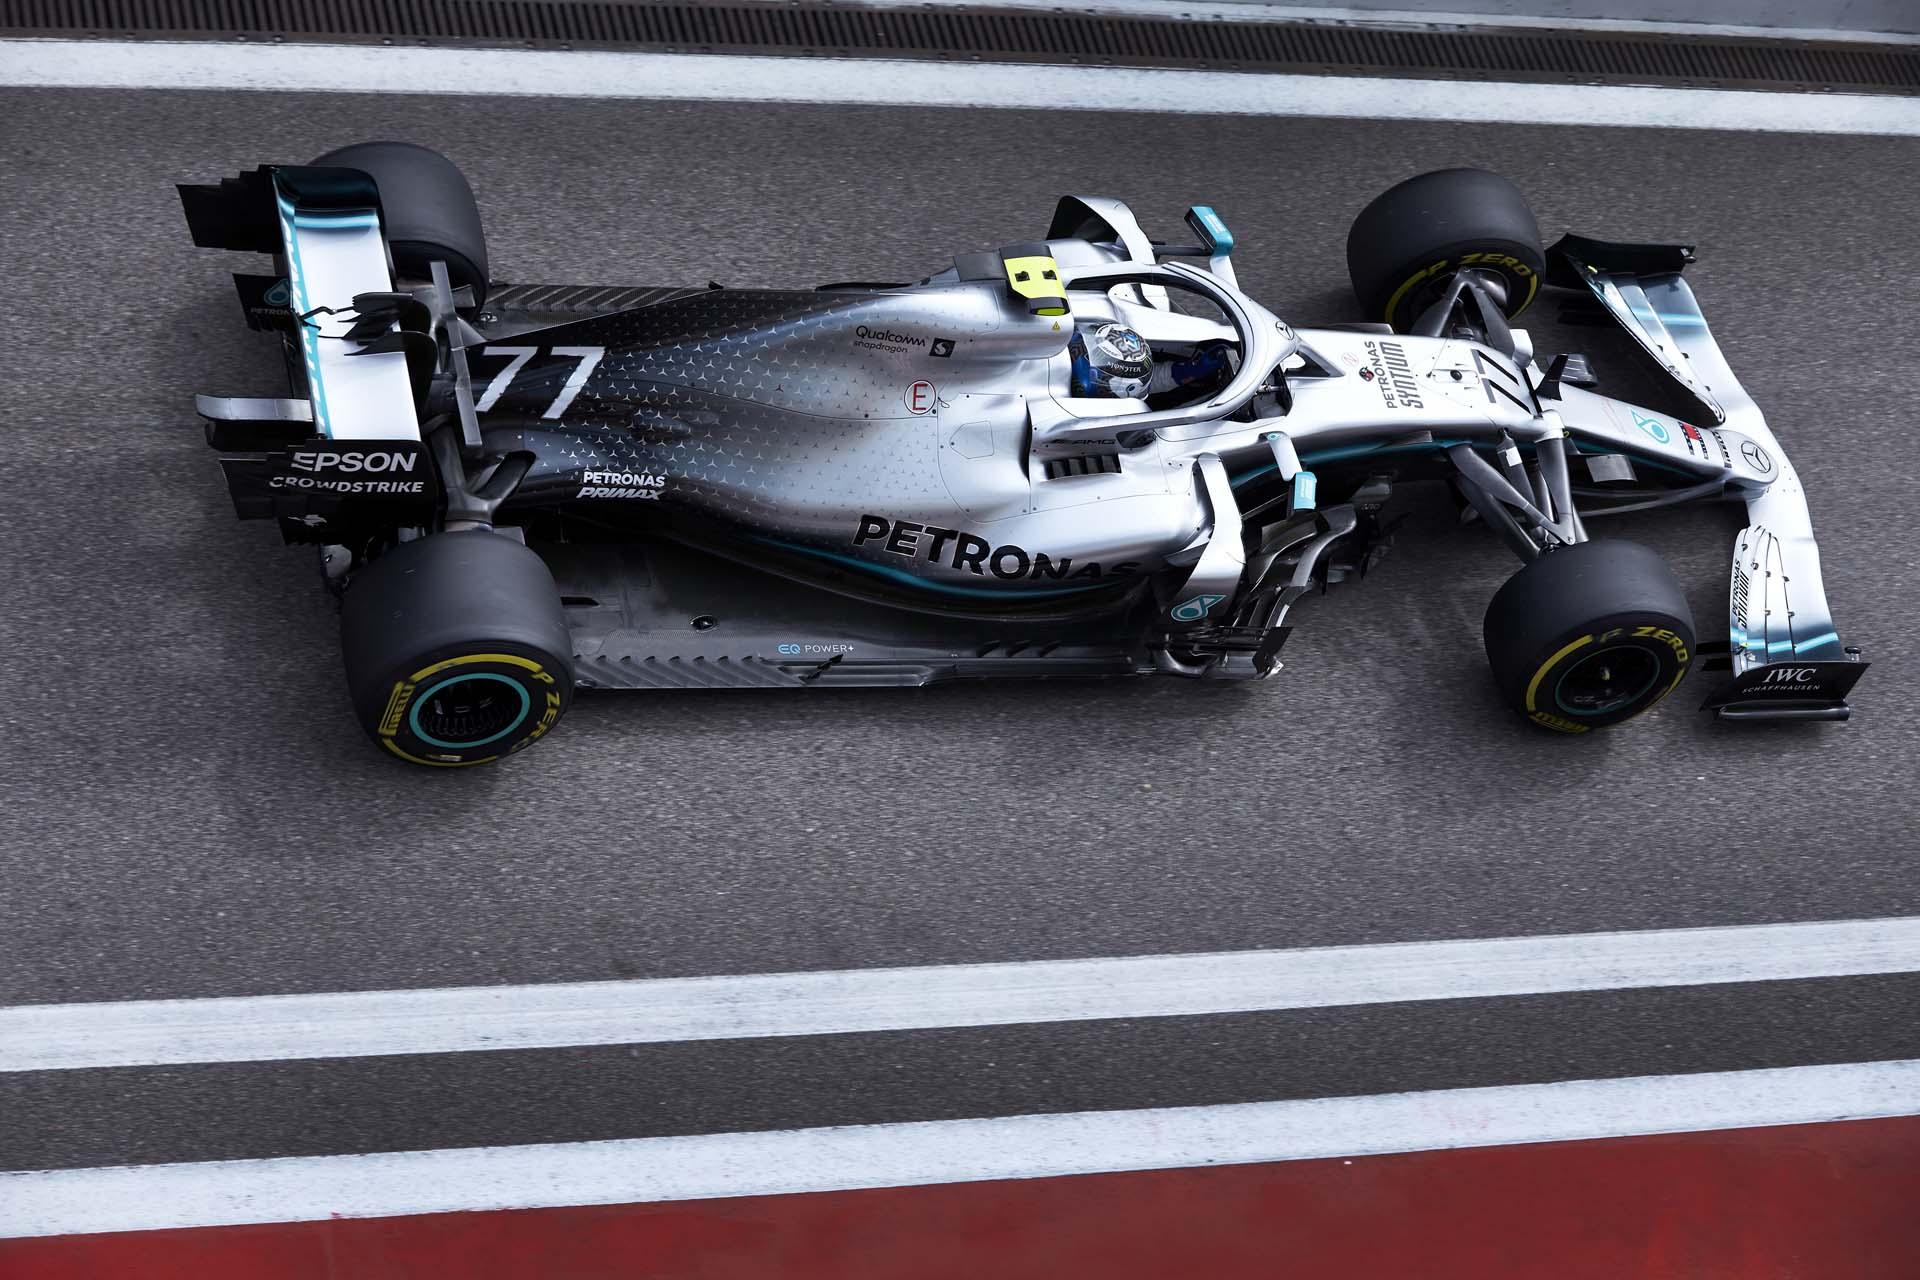 2019 Russian Grand Prix, Friday - Steve Etherington